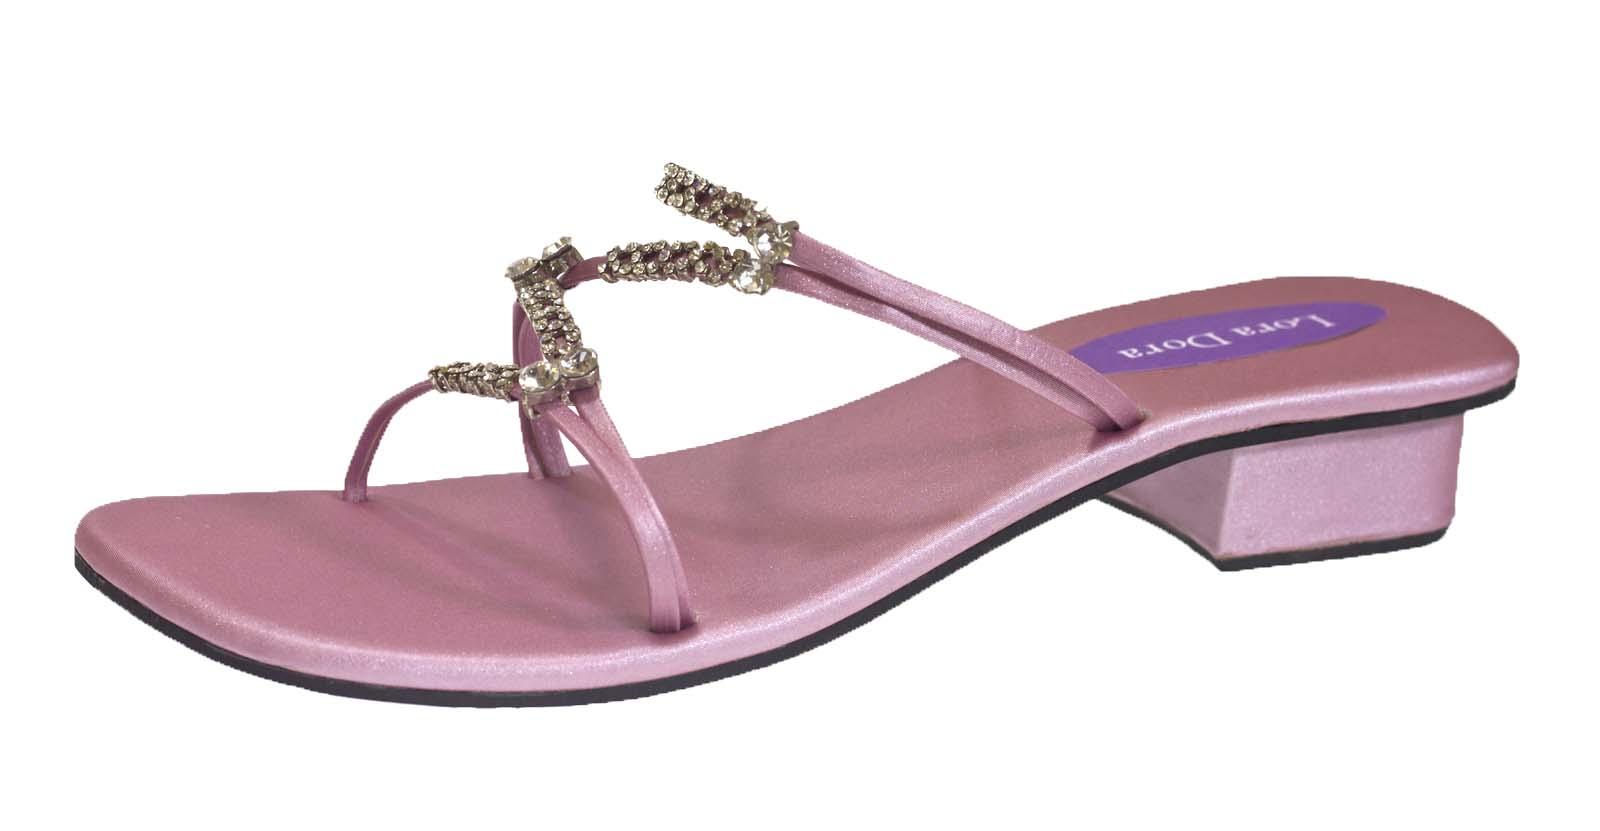 Womens Diamante Sandals Strappy Wedding Bridal Shoes Low Block Heels Ladies Size